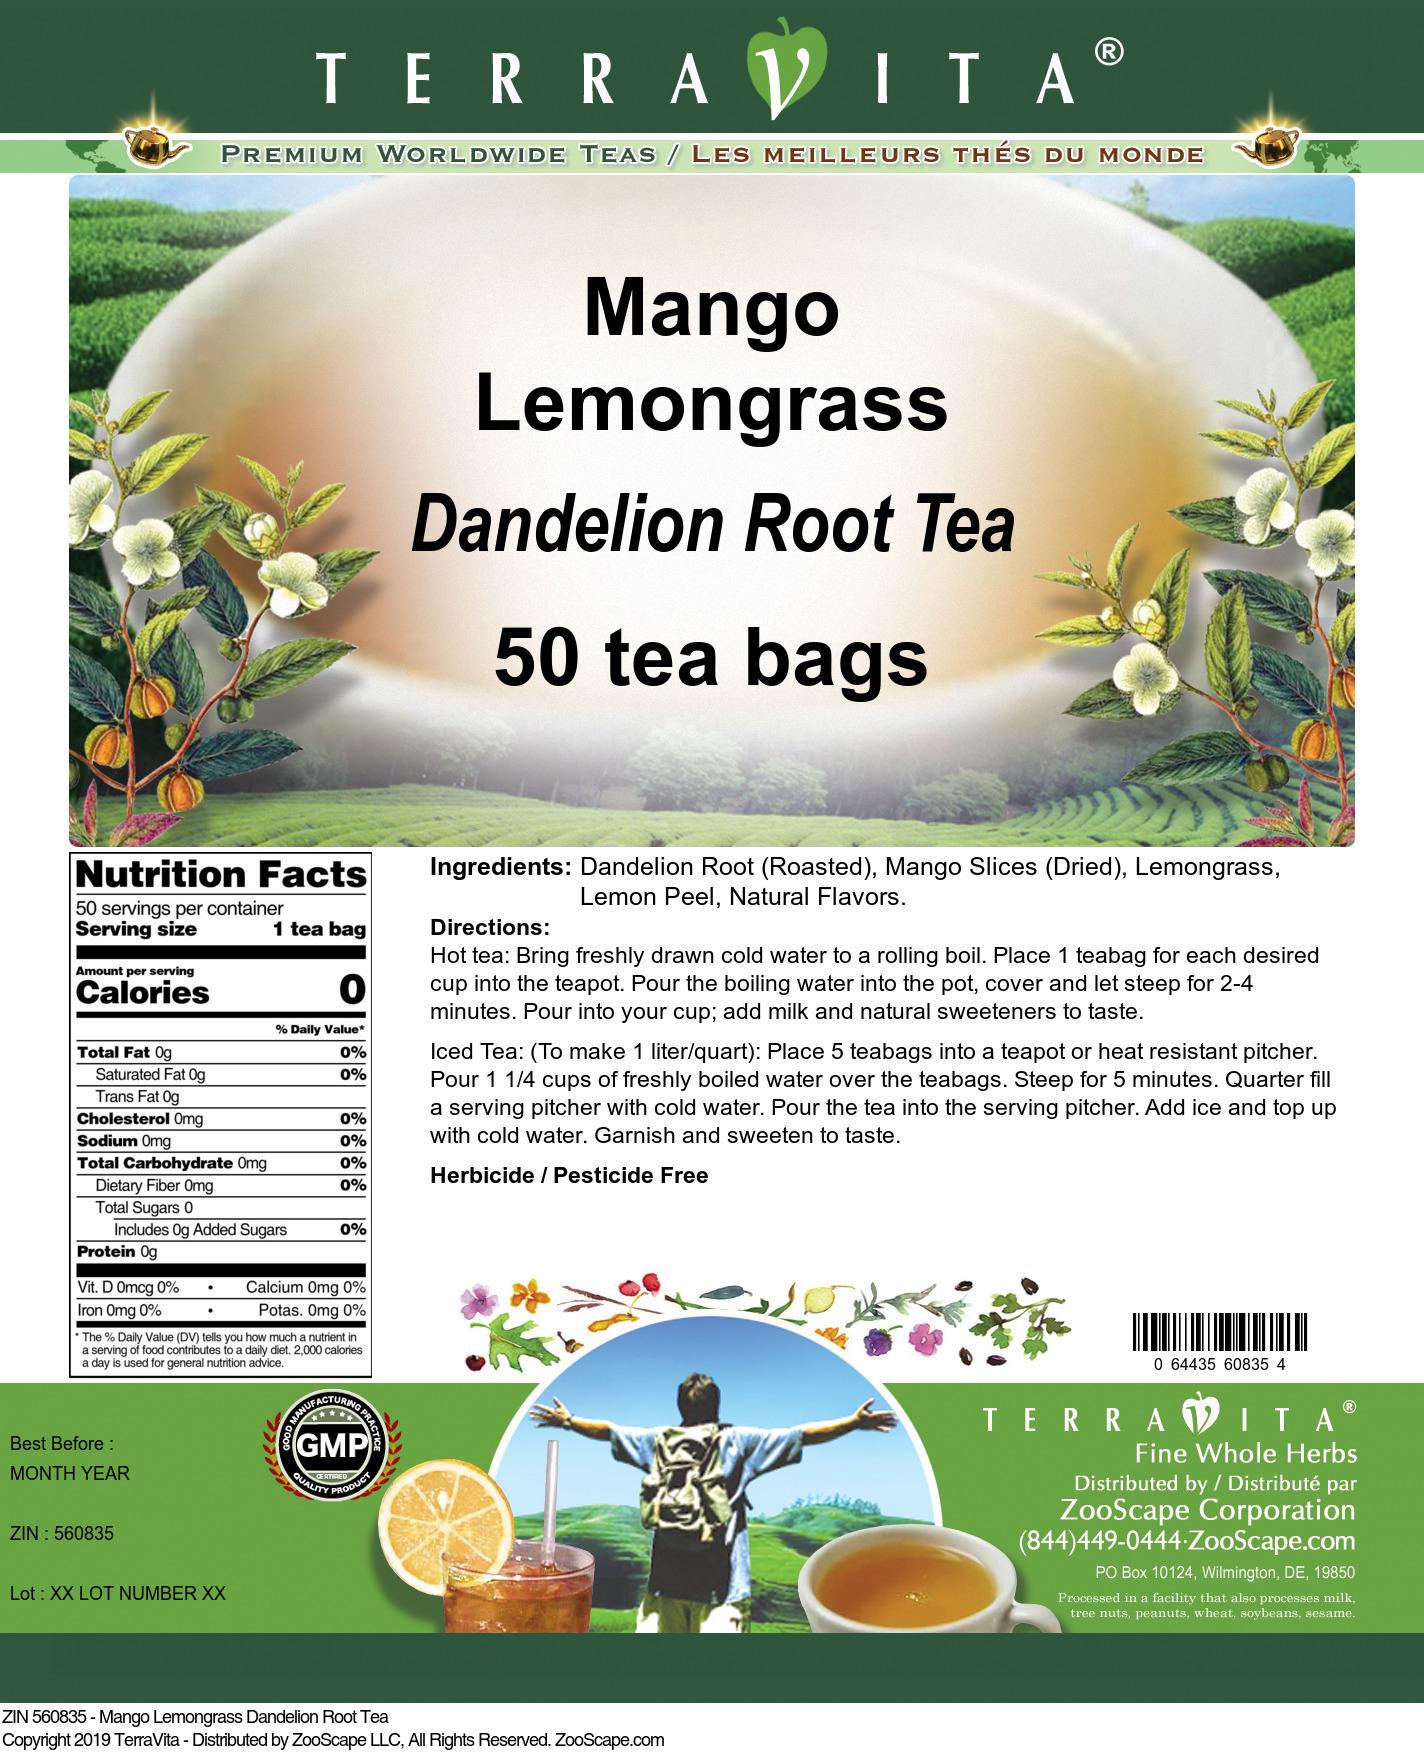 Mango Lemongrass Dandelion Root